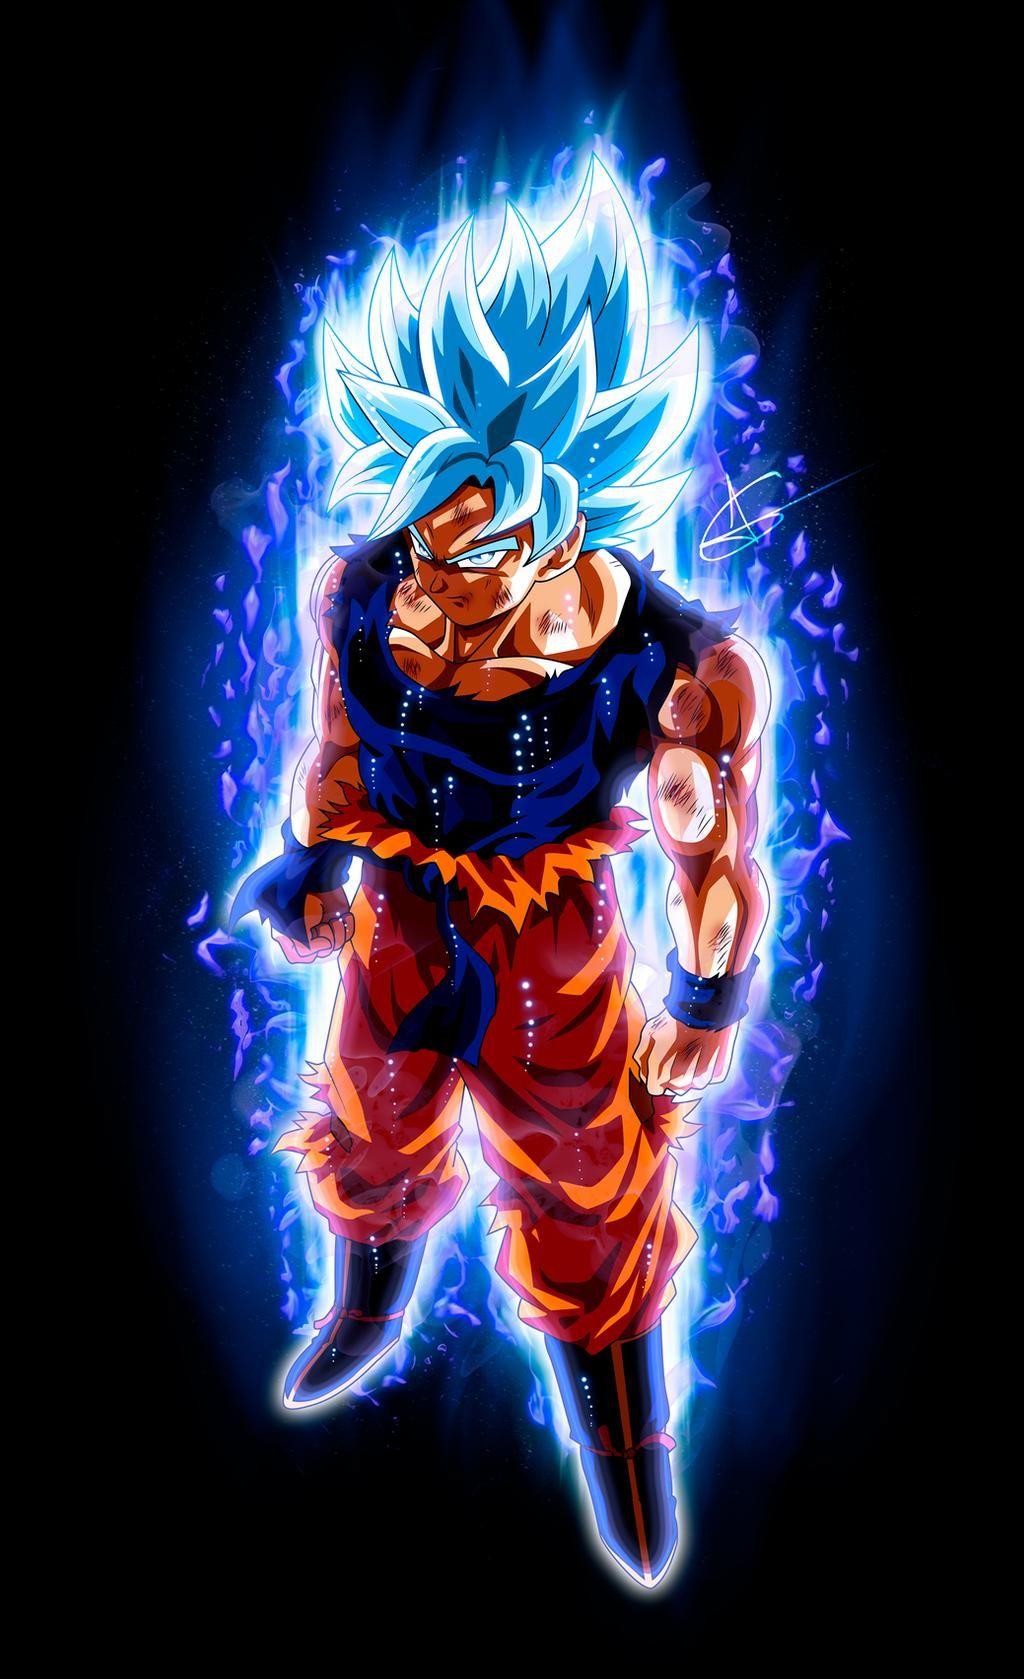 Goku Ultra Instinct Ssj Blue By Arlesonlui On Deviantart Goku Super Saiyan God Dragon Ball Art Goku Dragon Ball Super Manga